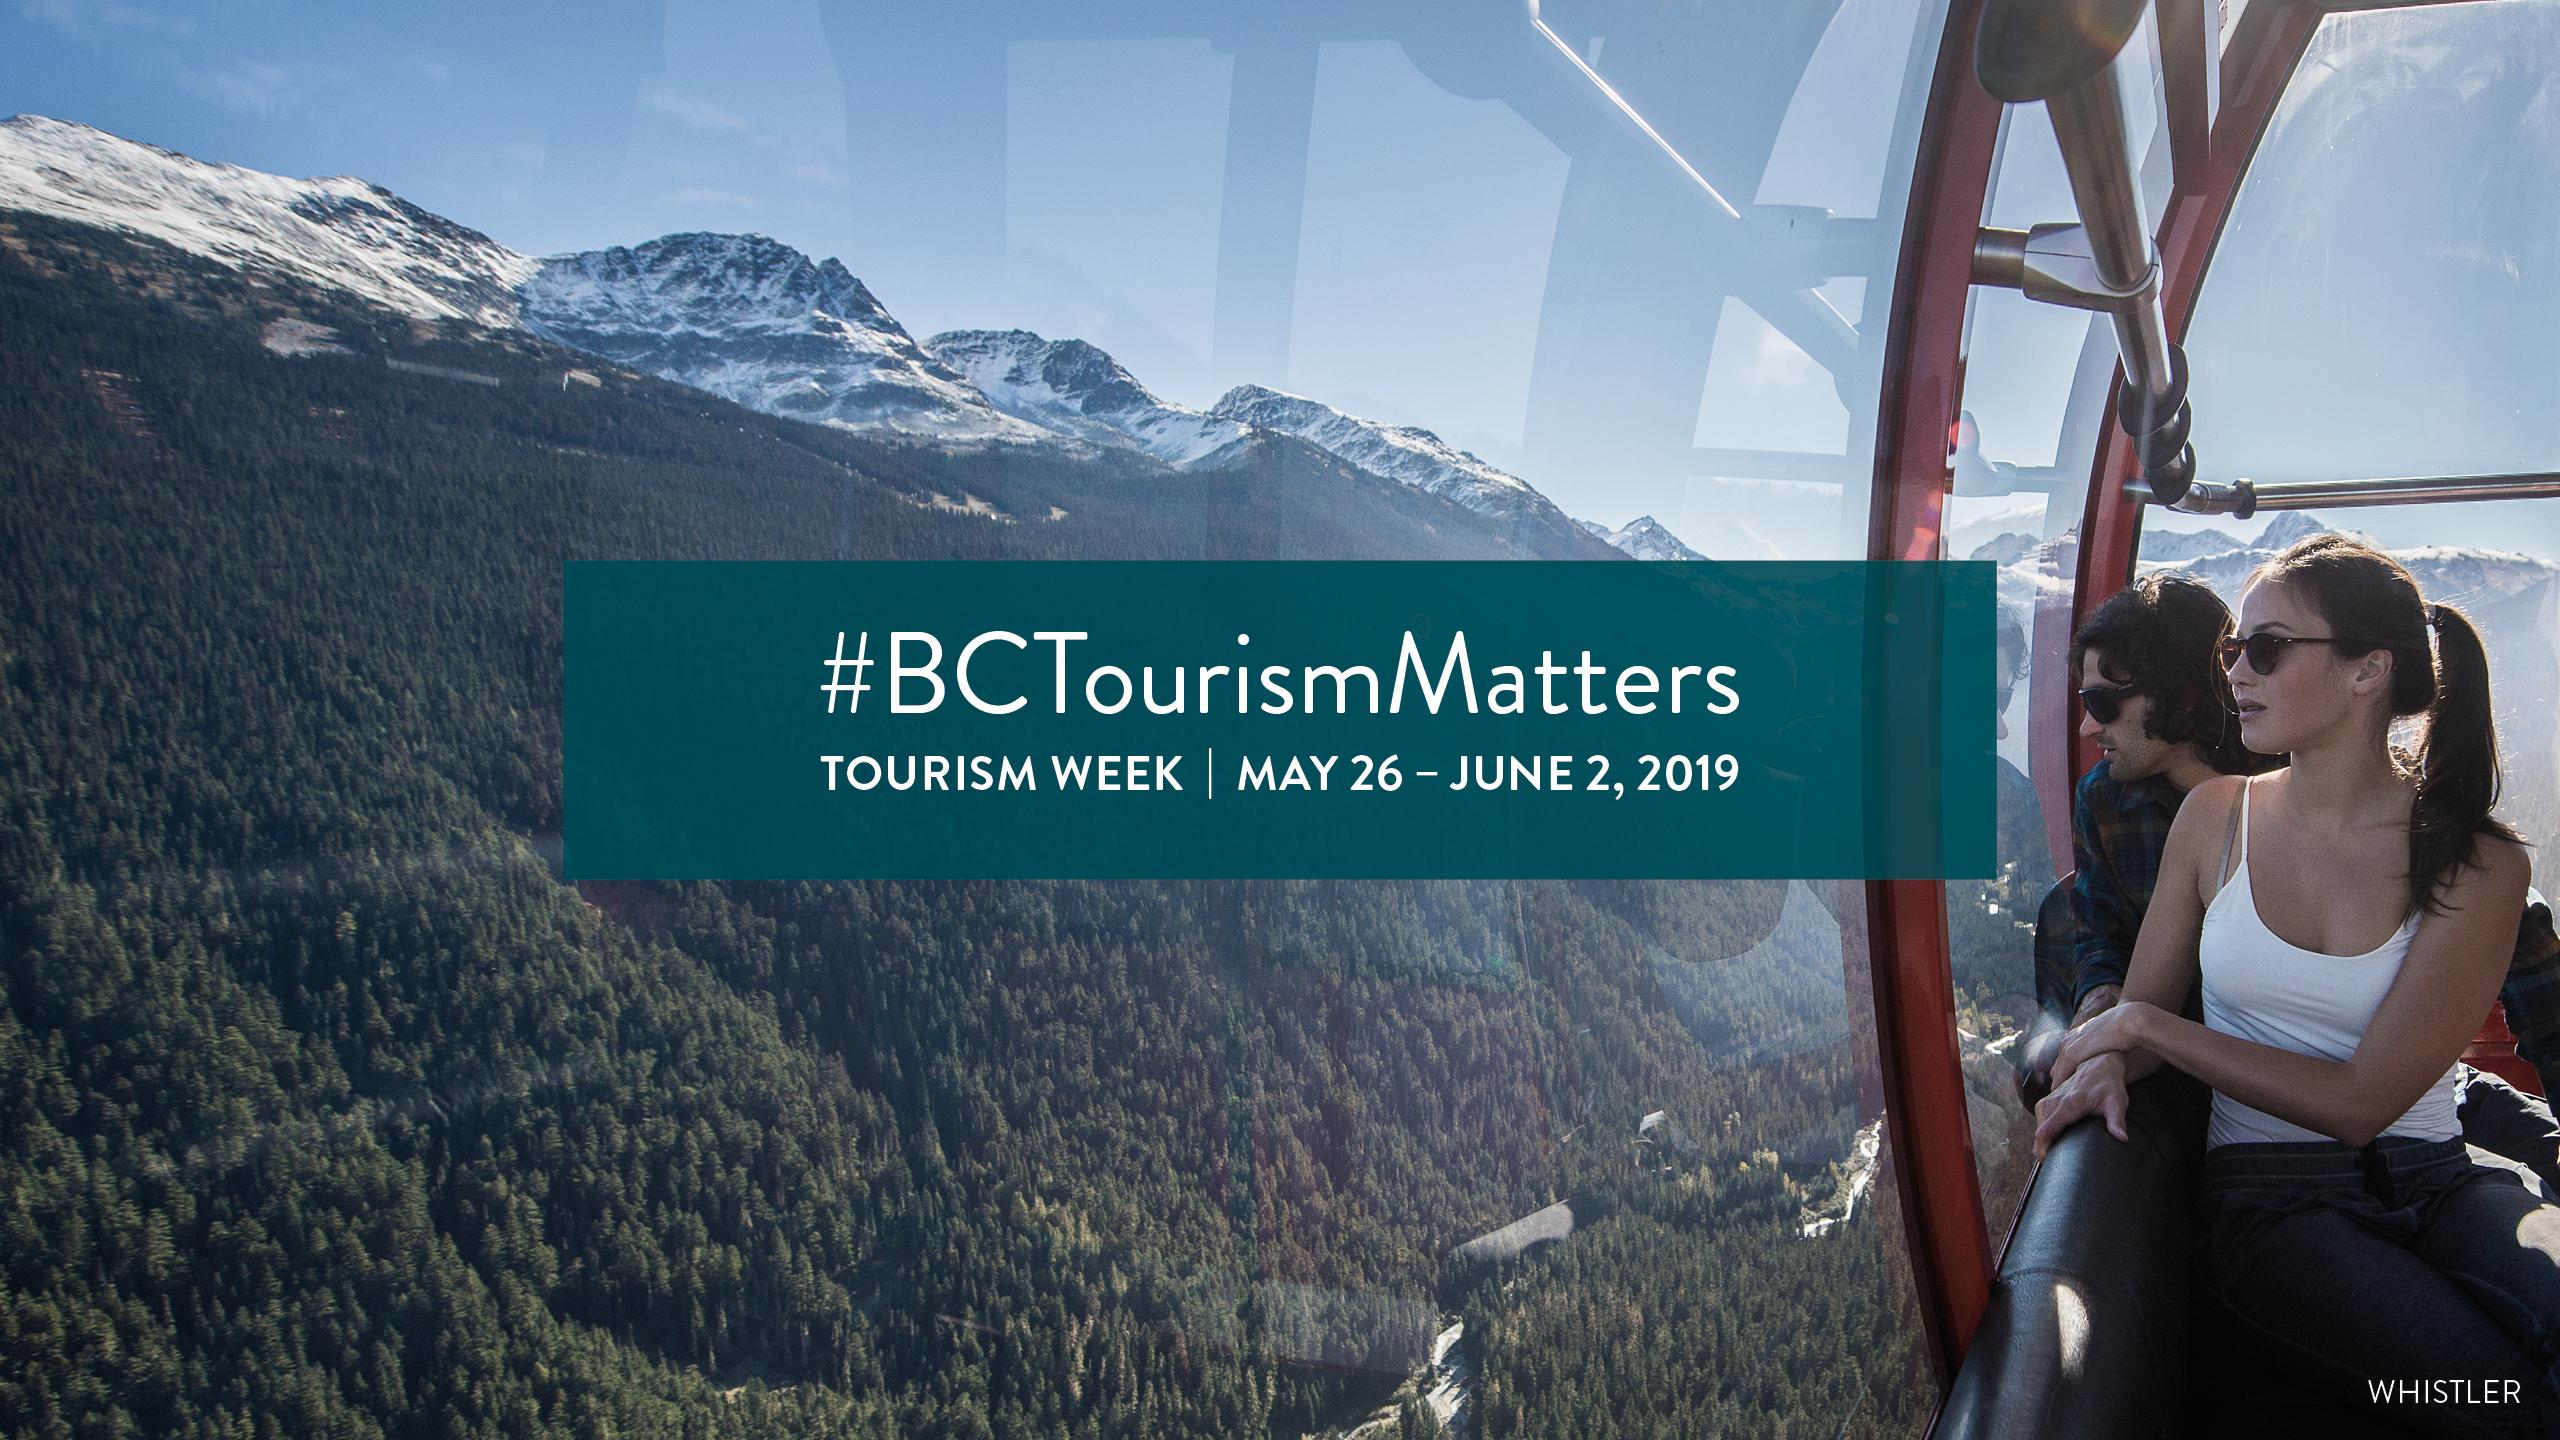 Tourism Week 2019 | Destination BC